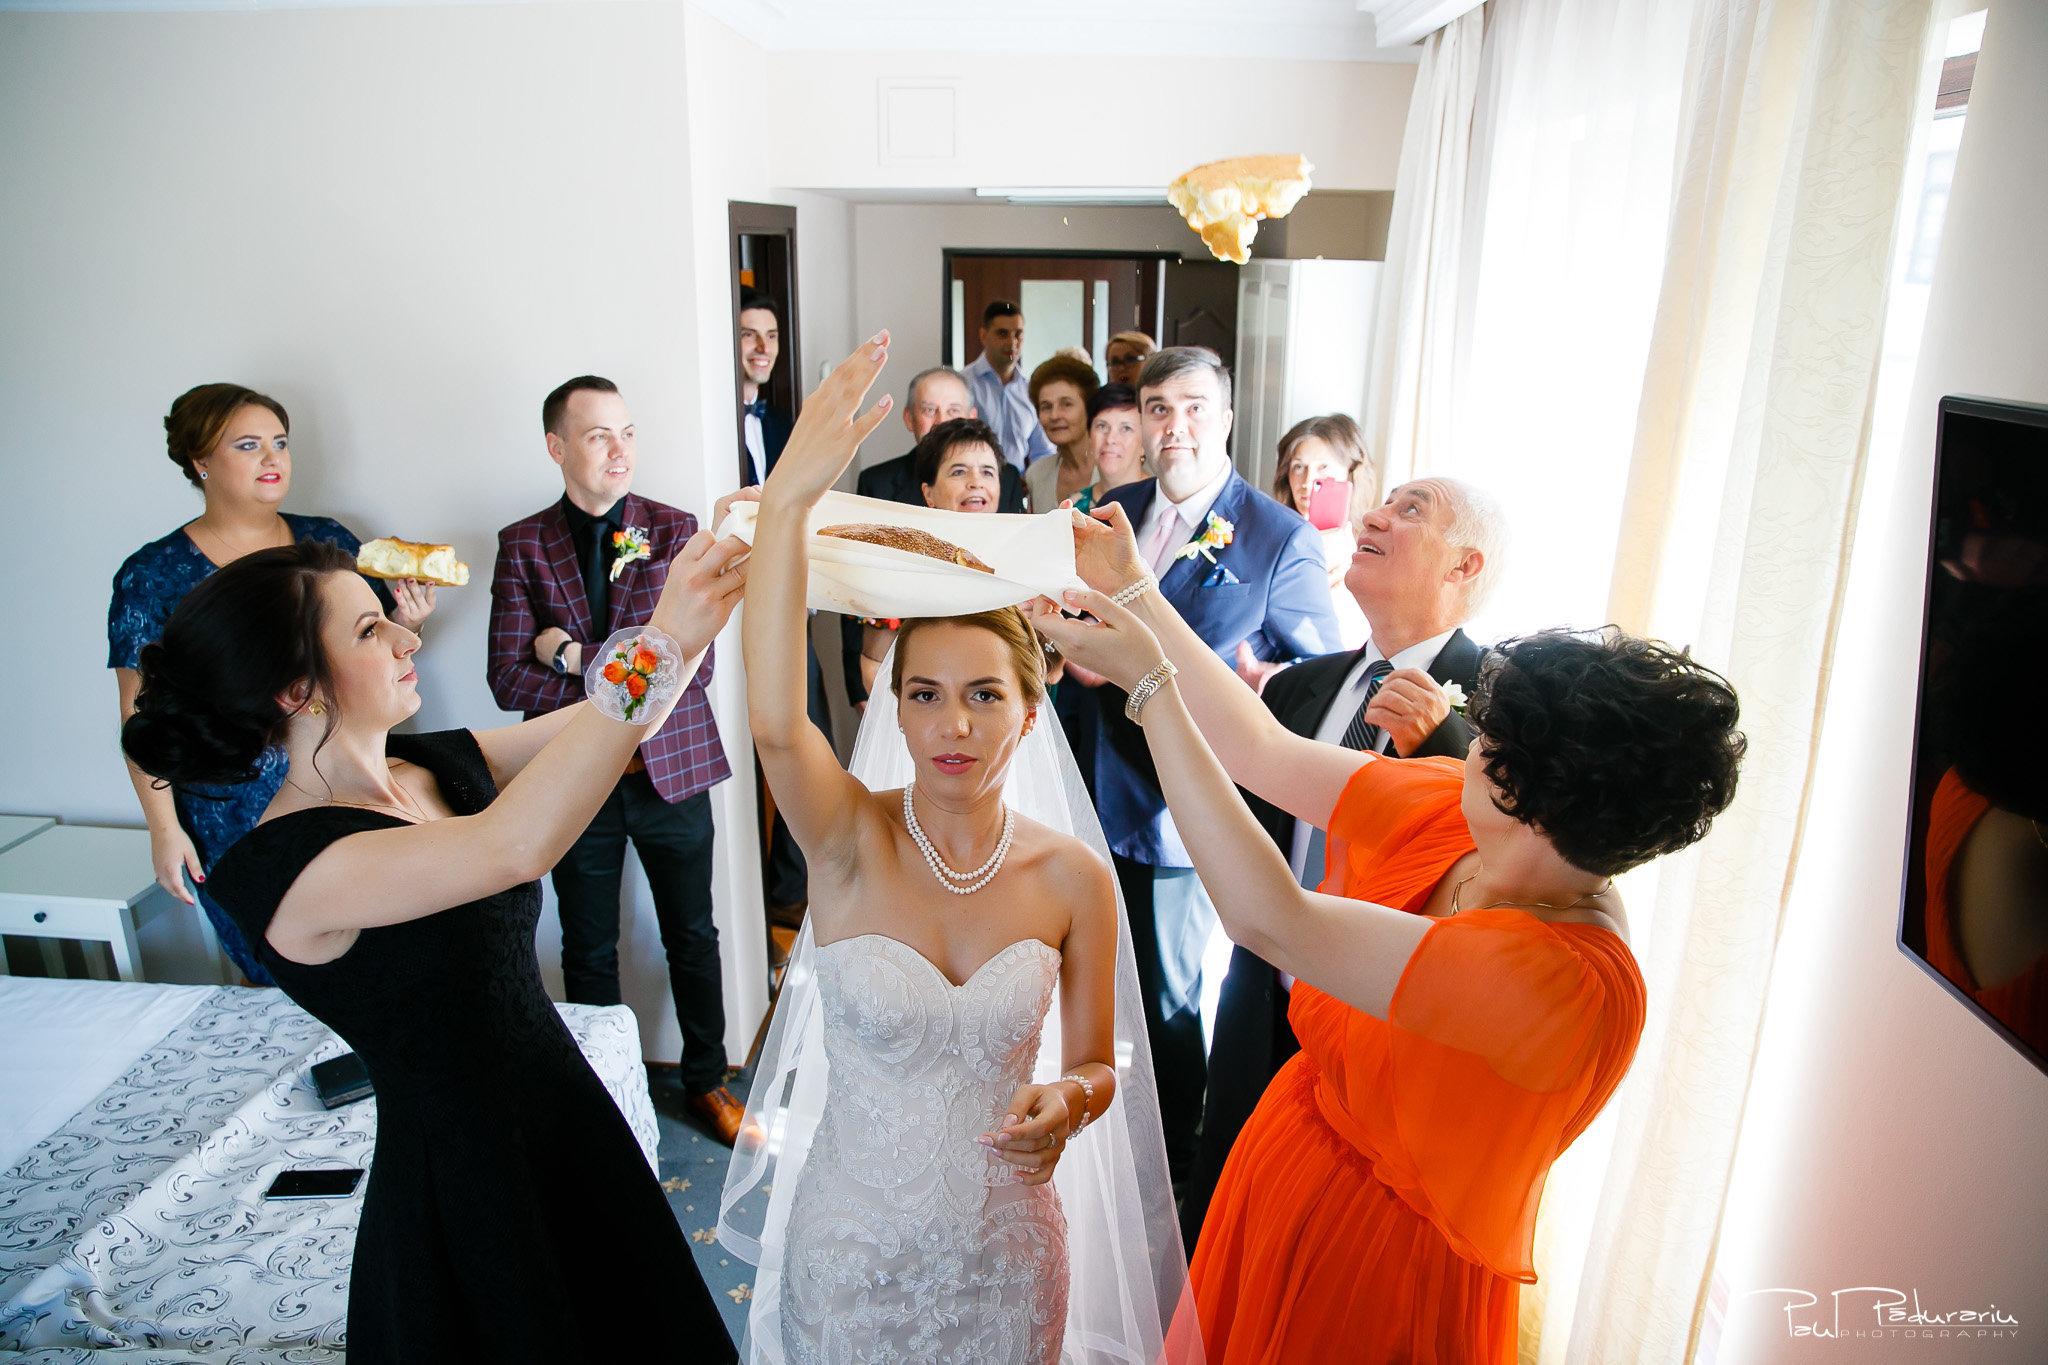 Roxana si Silviu Nunta Hotel Eden Iasi - aruncatul turtei miresei fotograf profesionist nunta www.paulpadurariu.ro © 2017 Paul Padurariu